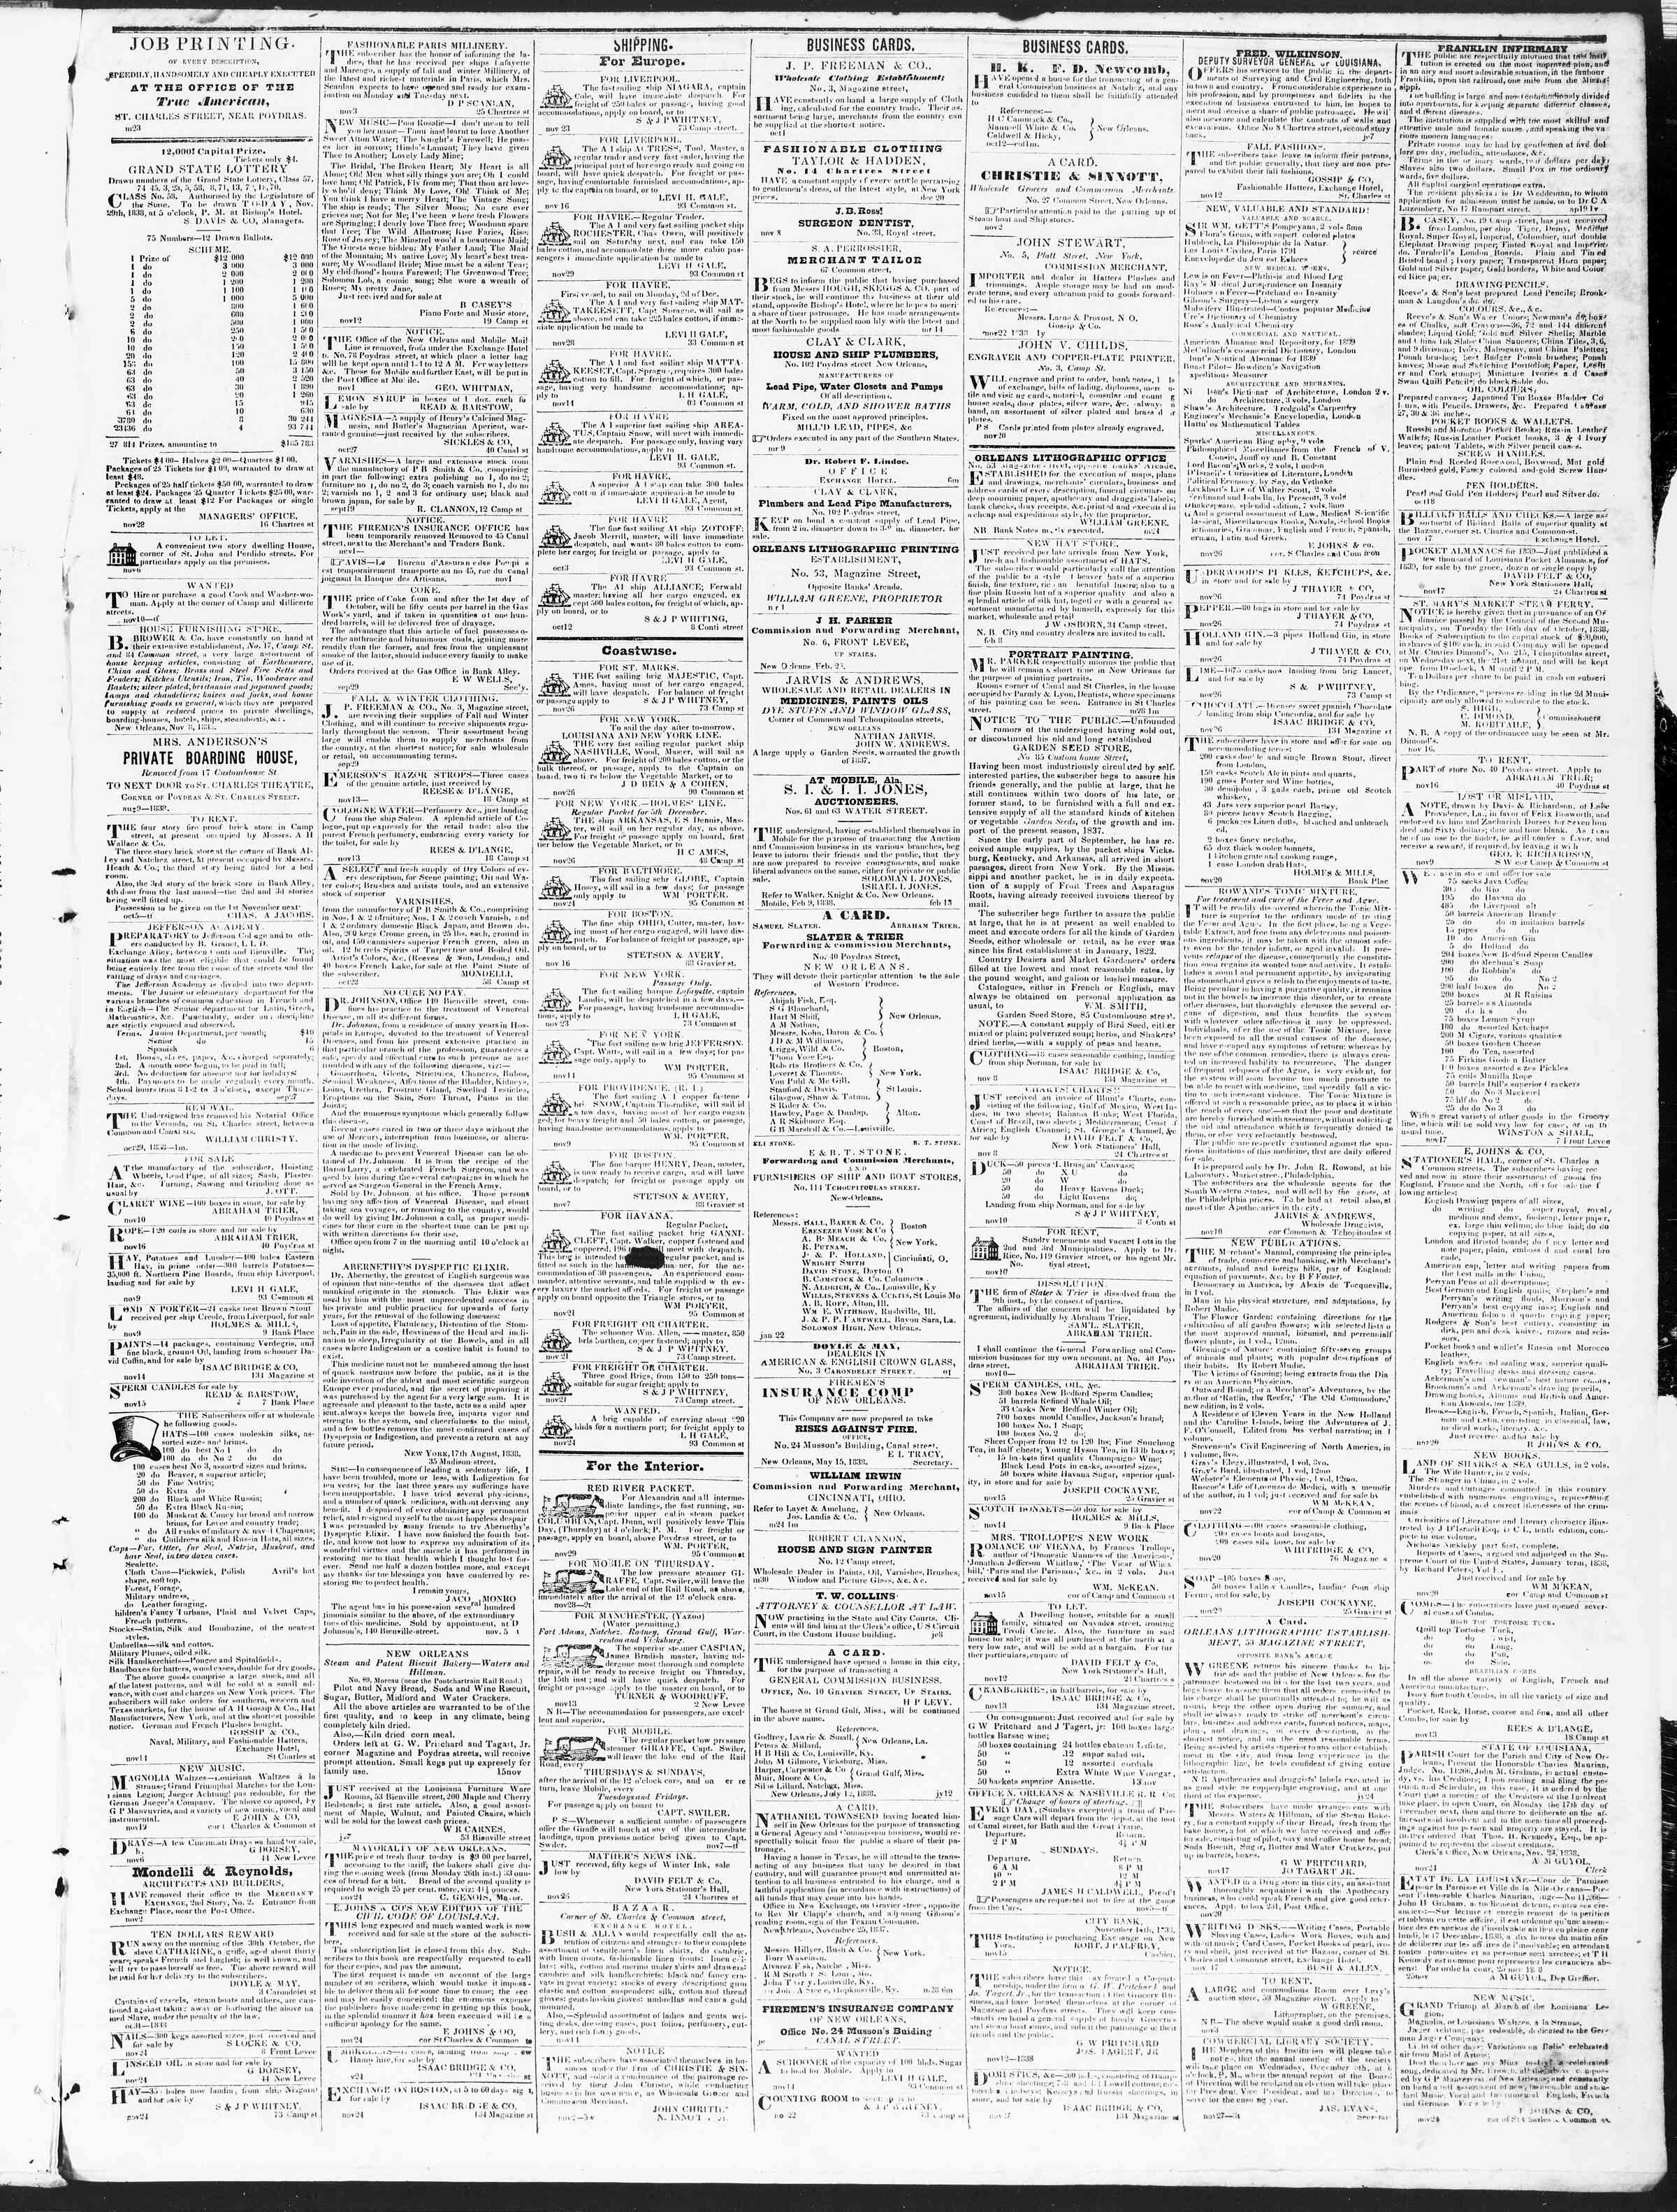 November 29, 1838 Tarihli True American Gazetesi Sayfa 3